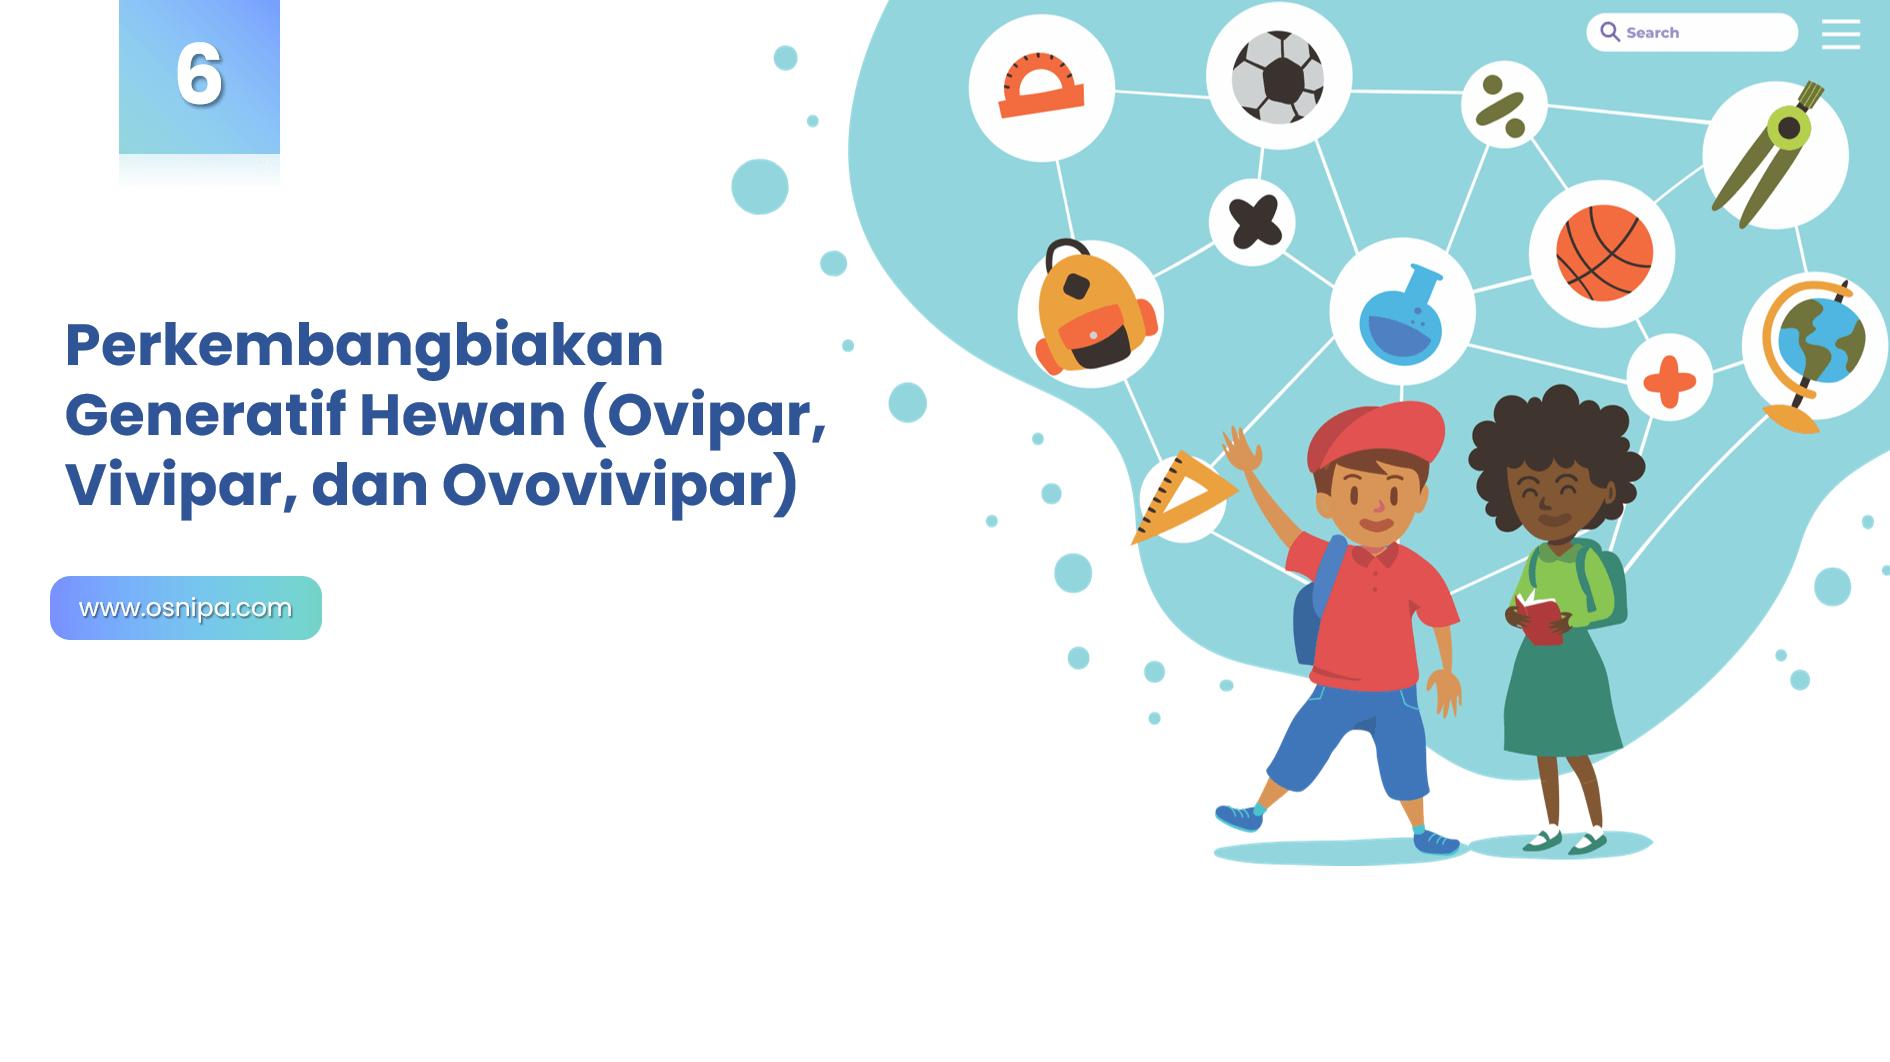 Perkembangbiakan Generatif Hewan (Ovipar, Vivipar, dan Ovovivipar)